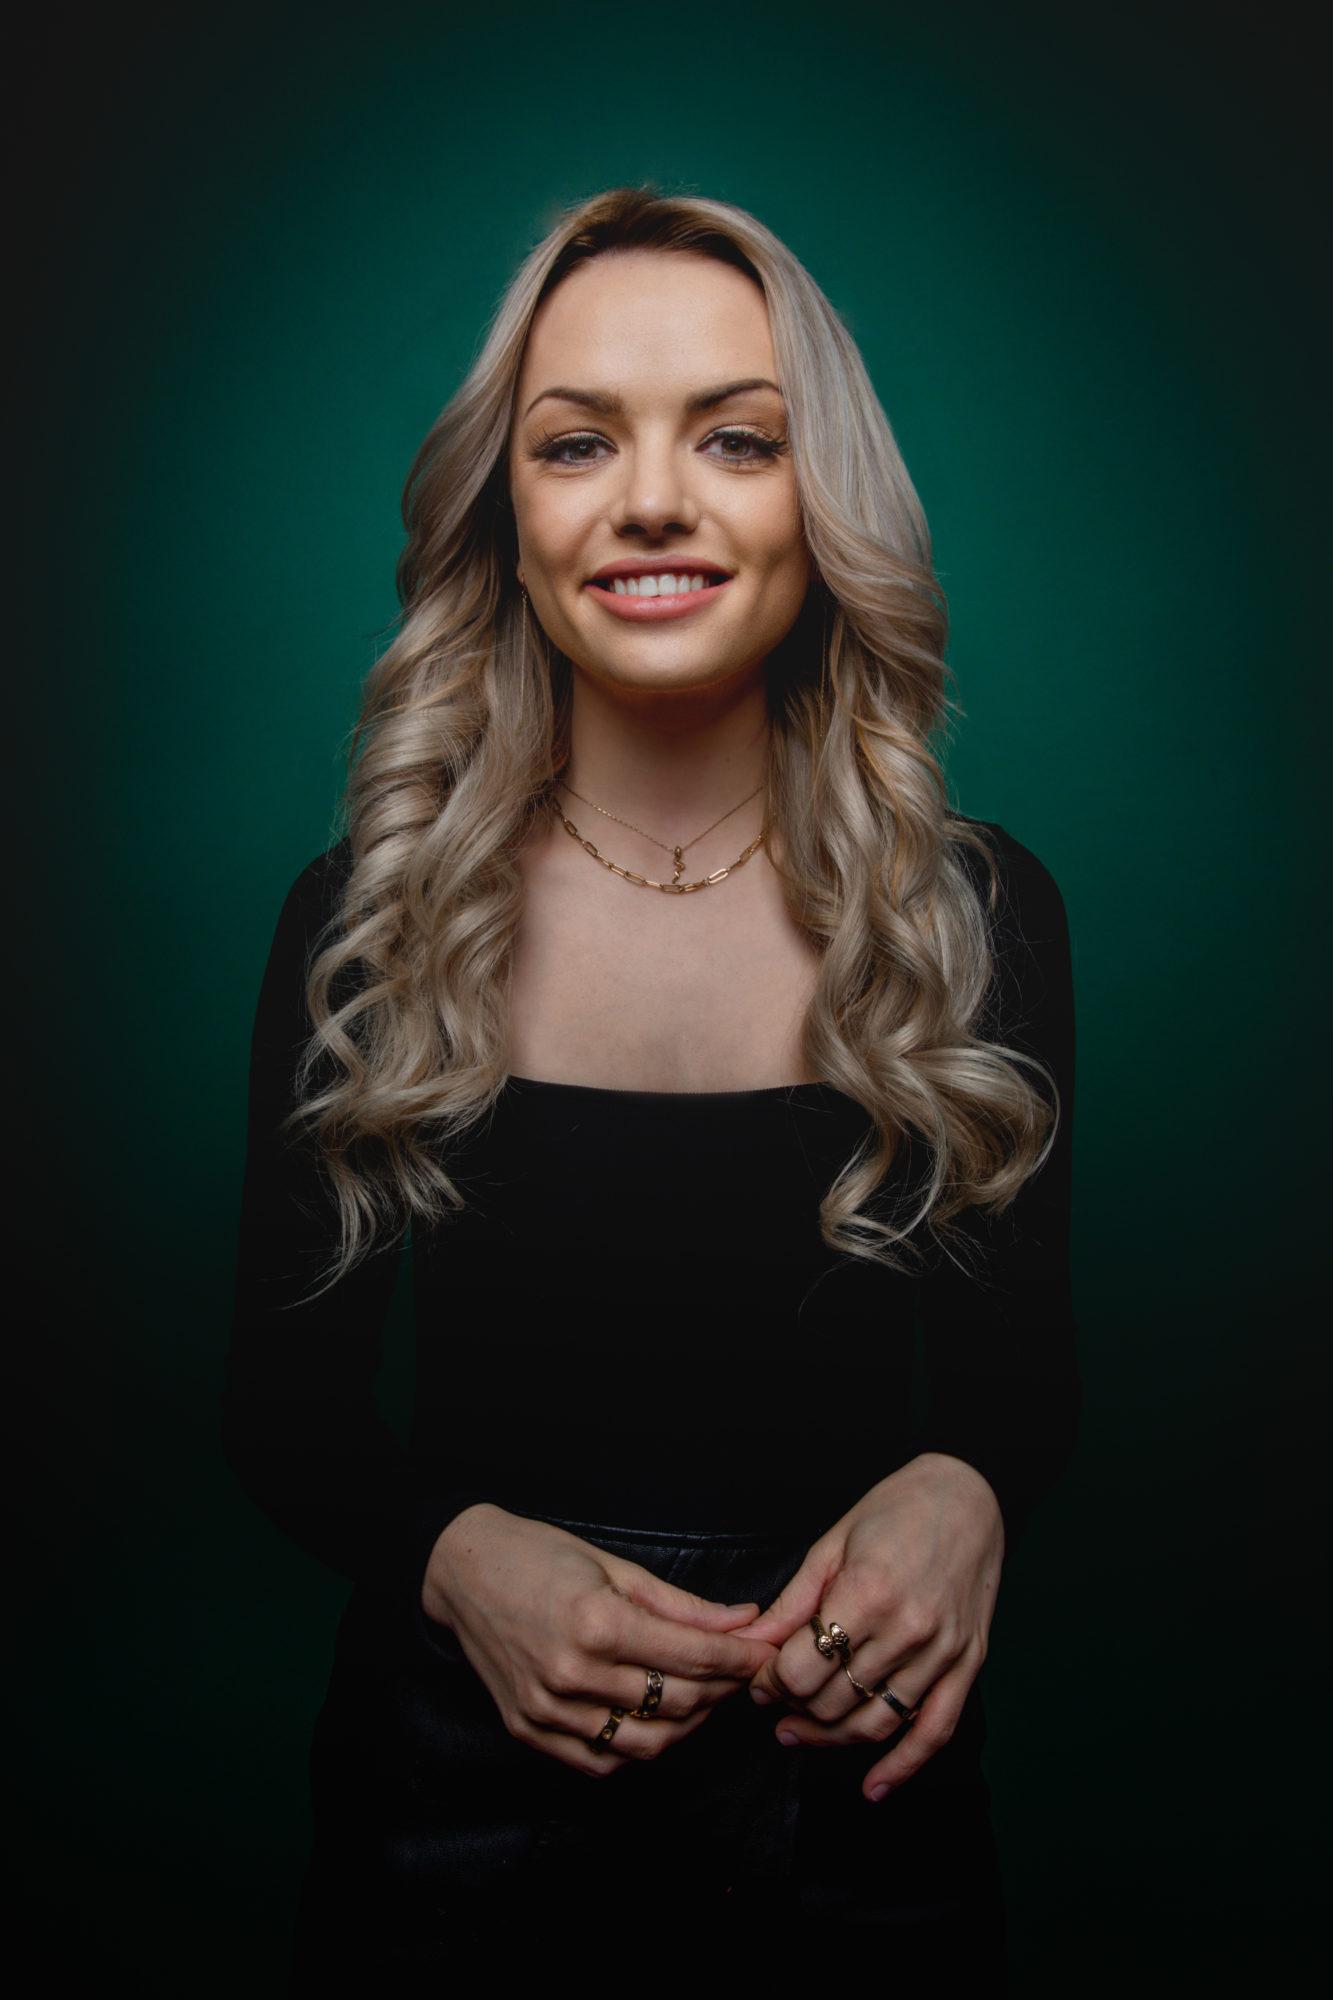 Sasha Sloan | 2021 30 Women to Watch | Utah Business